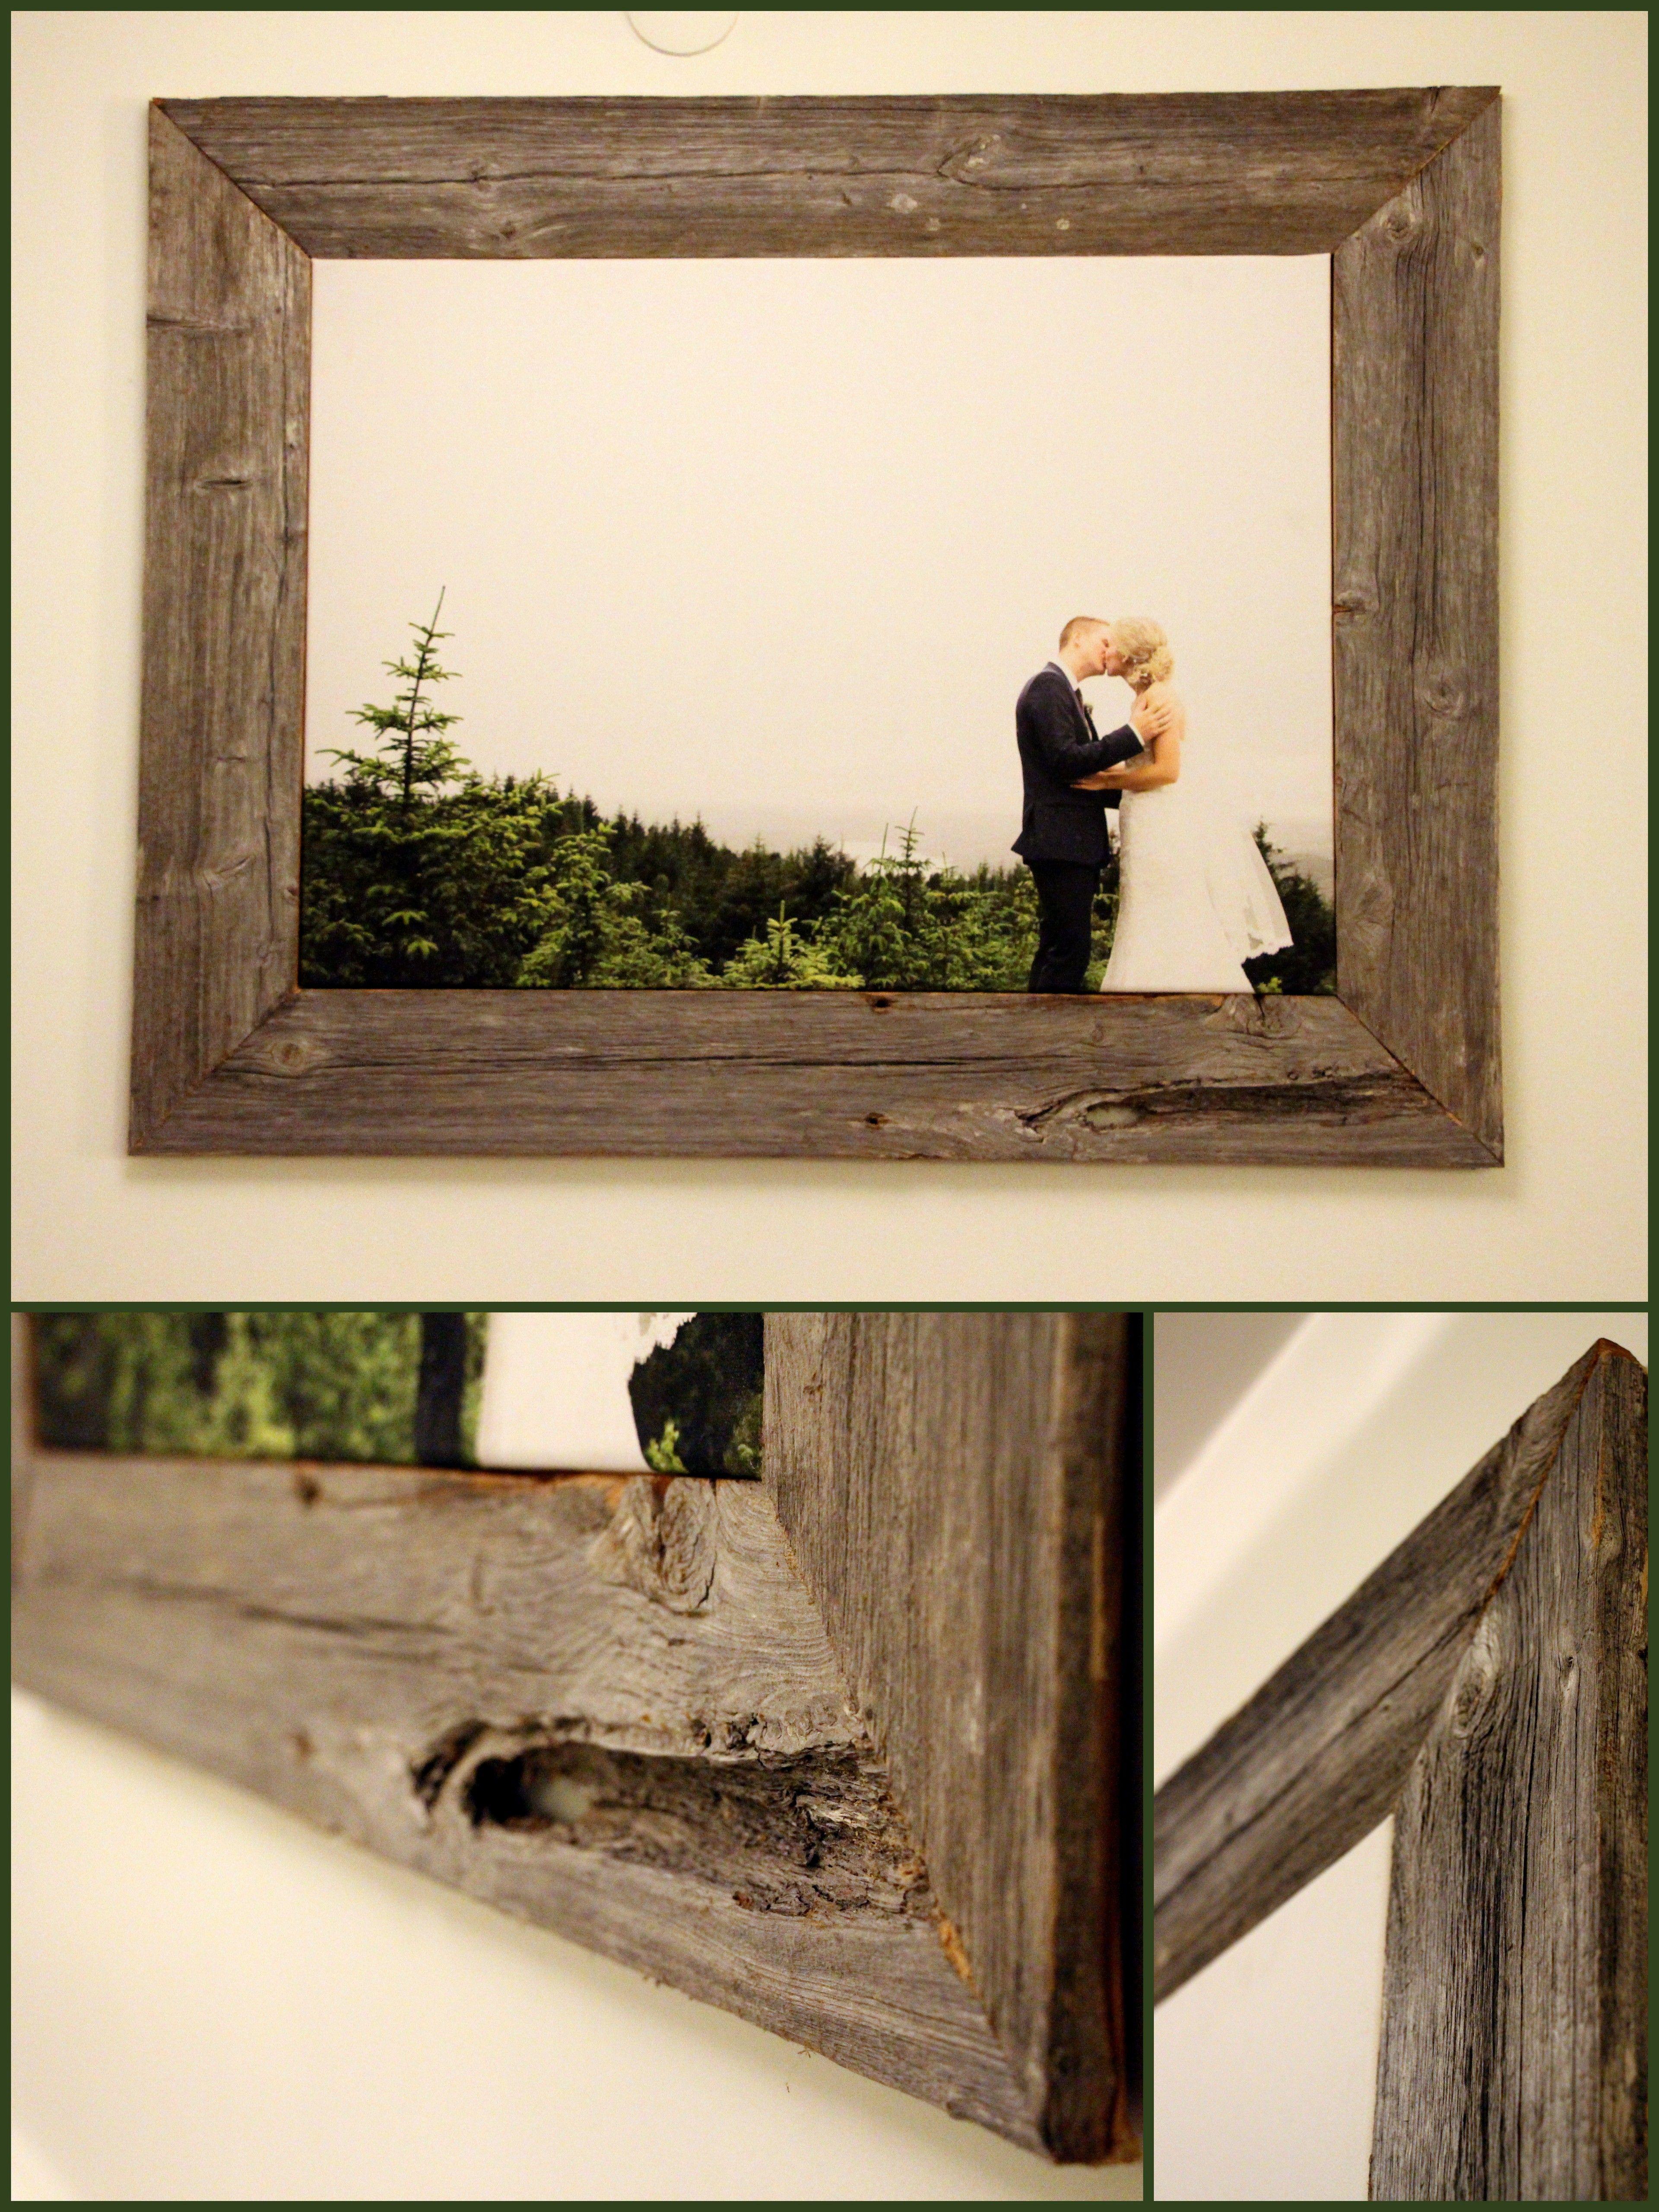 DIY - Old Barn Wood Frame | Pictures | Pinterest | Barn wood, Barn ...